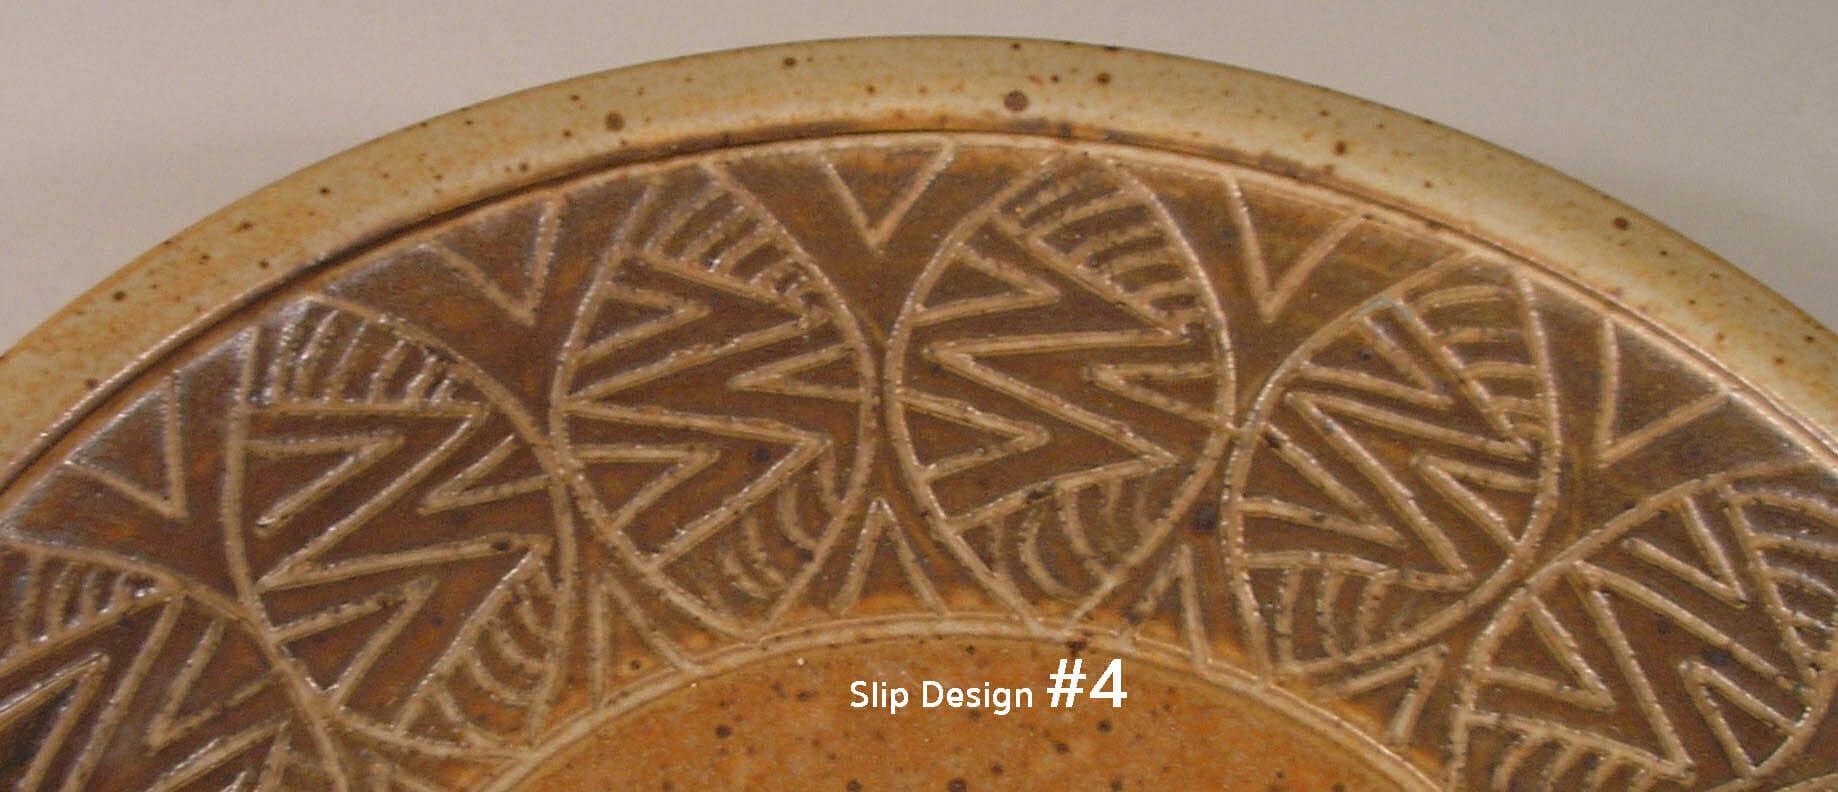 SLIP DESIGN NO. 4